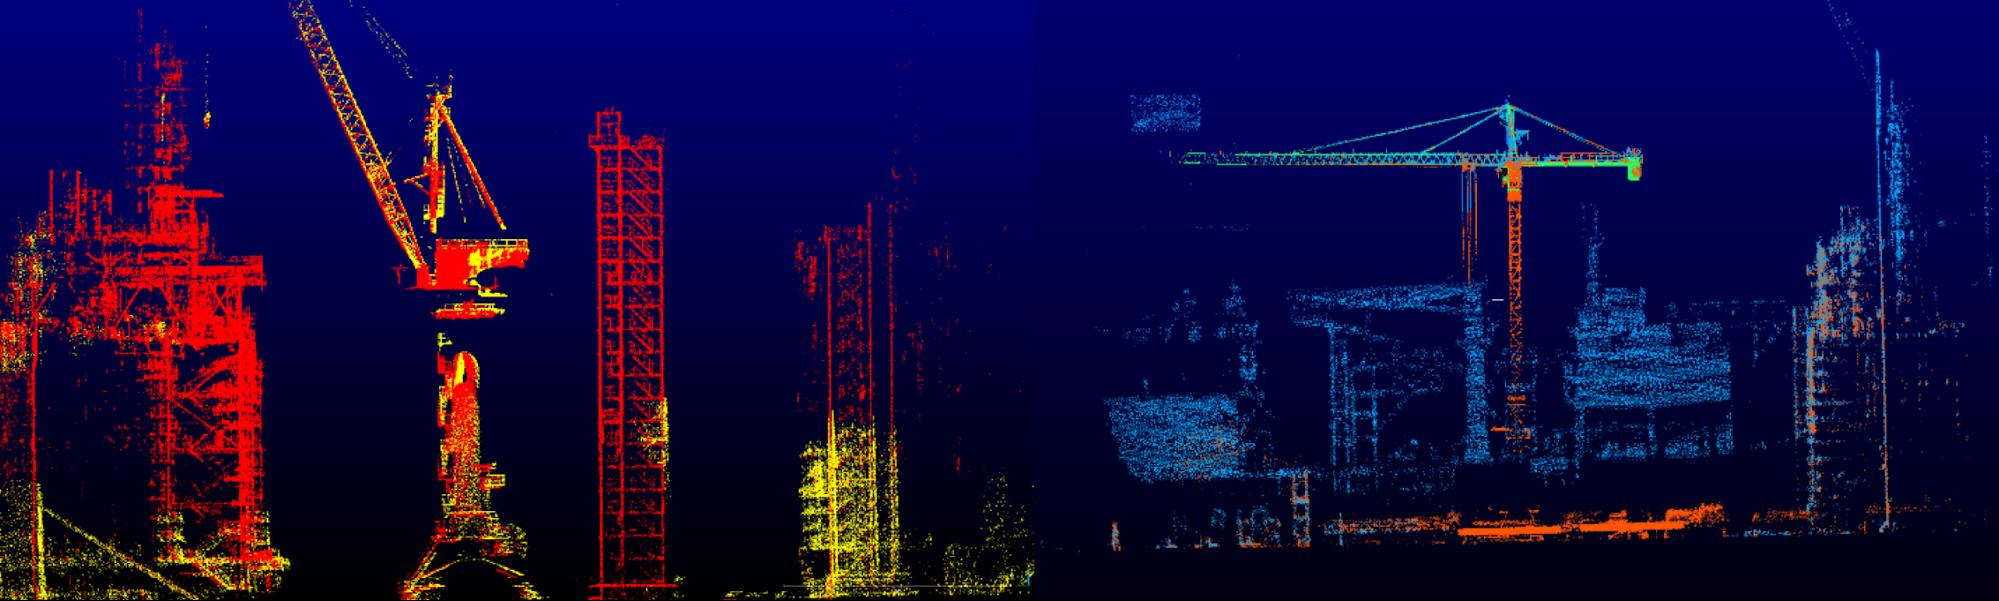 image4-Apr-13-2021-07-54-23-97-PM